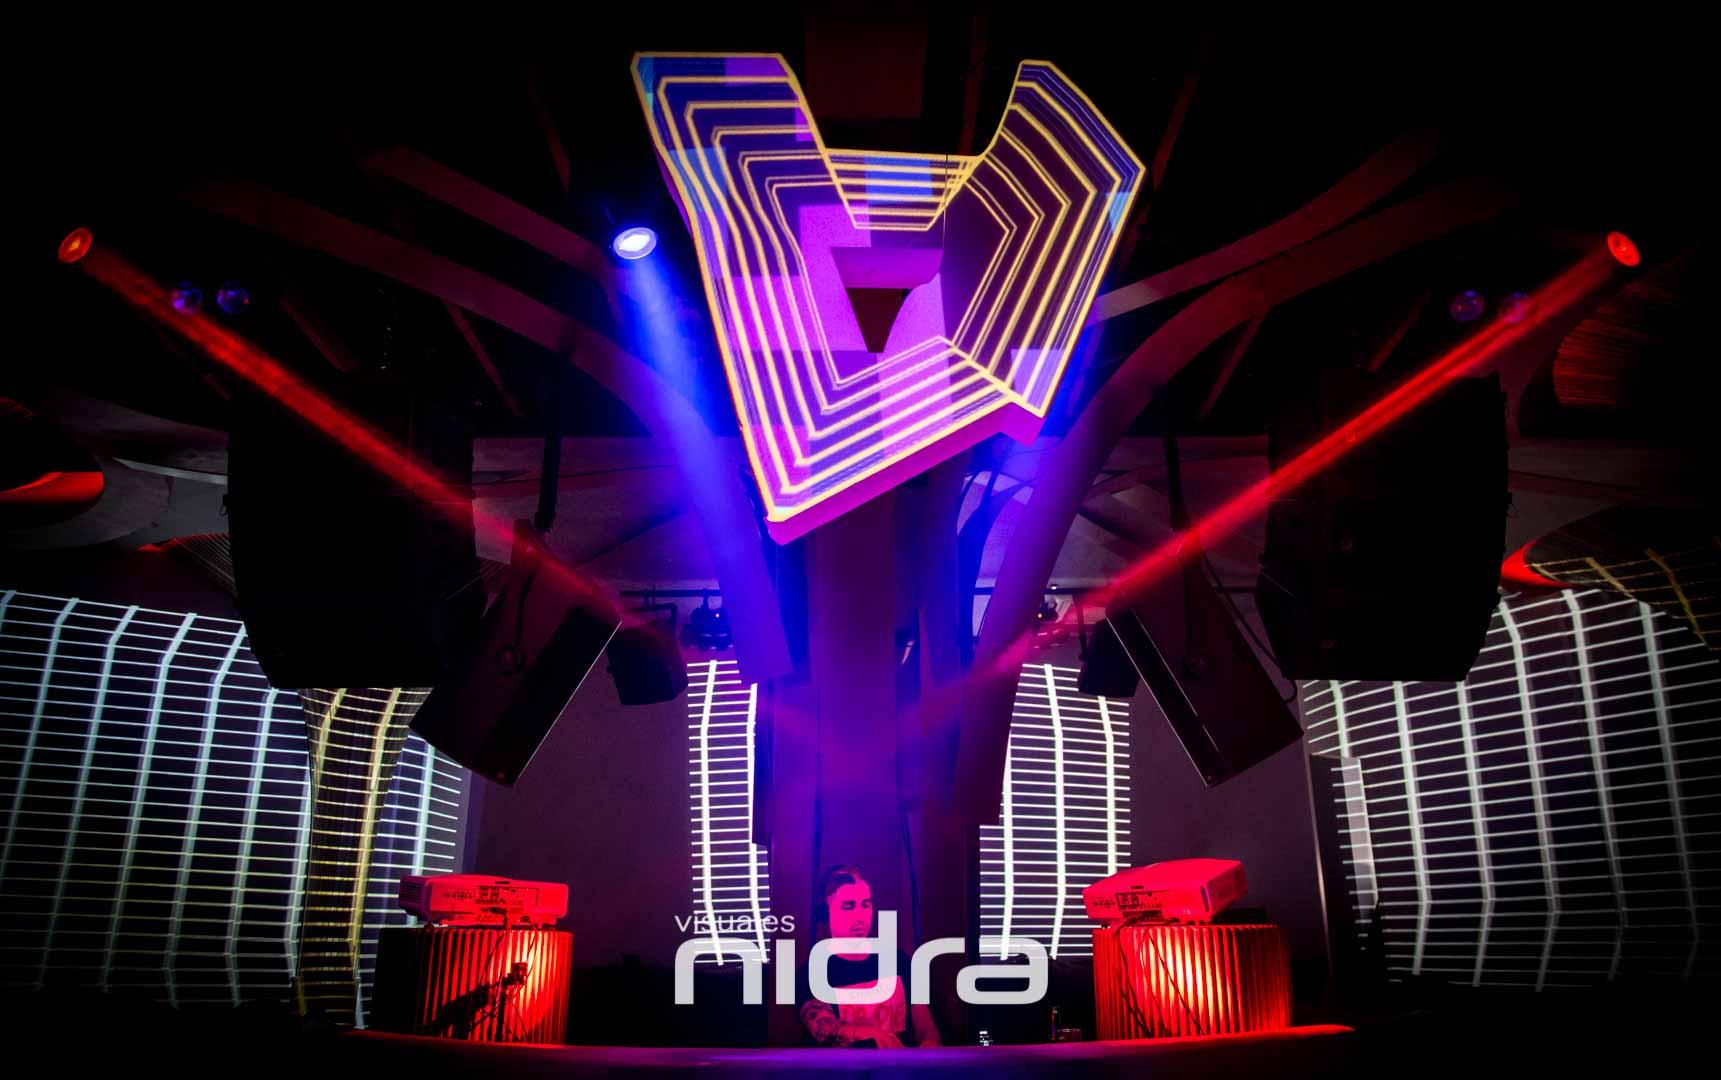 Visuales Nidra Nemaniax Video Mapping Momento Marbella DJ Luciano